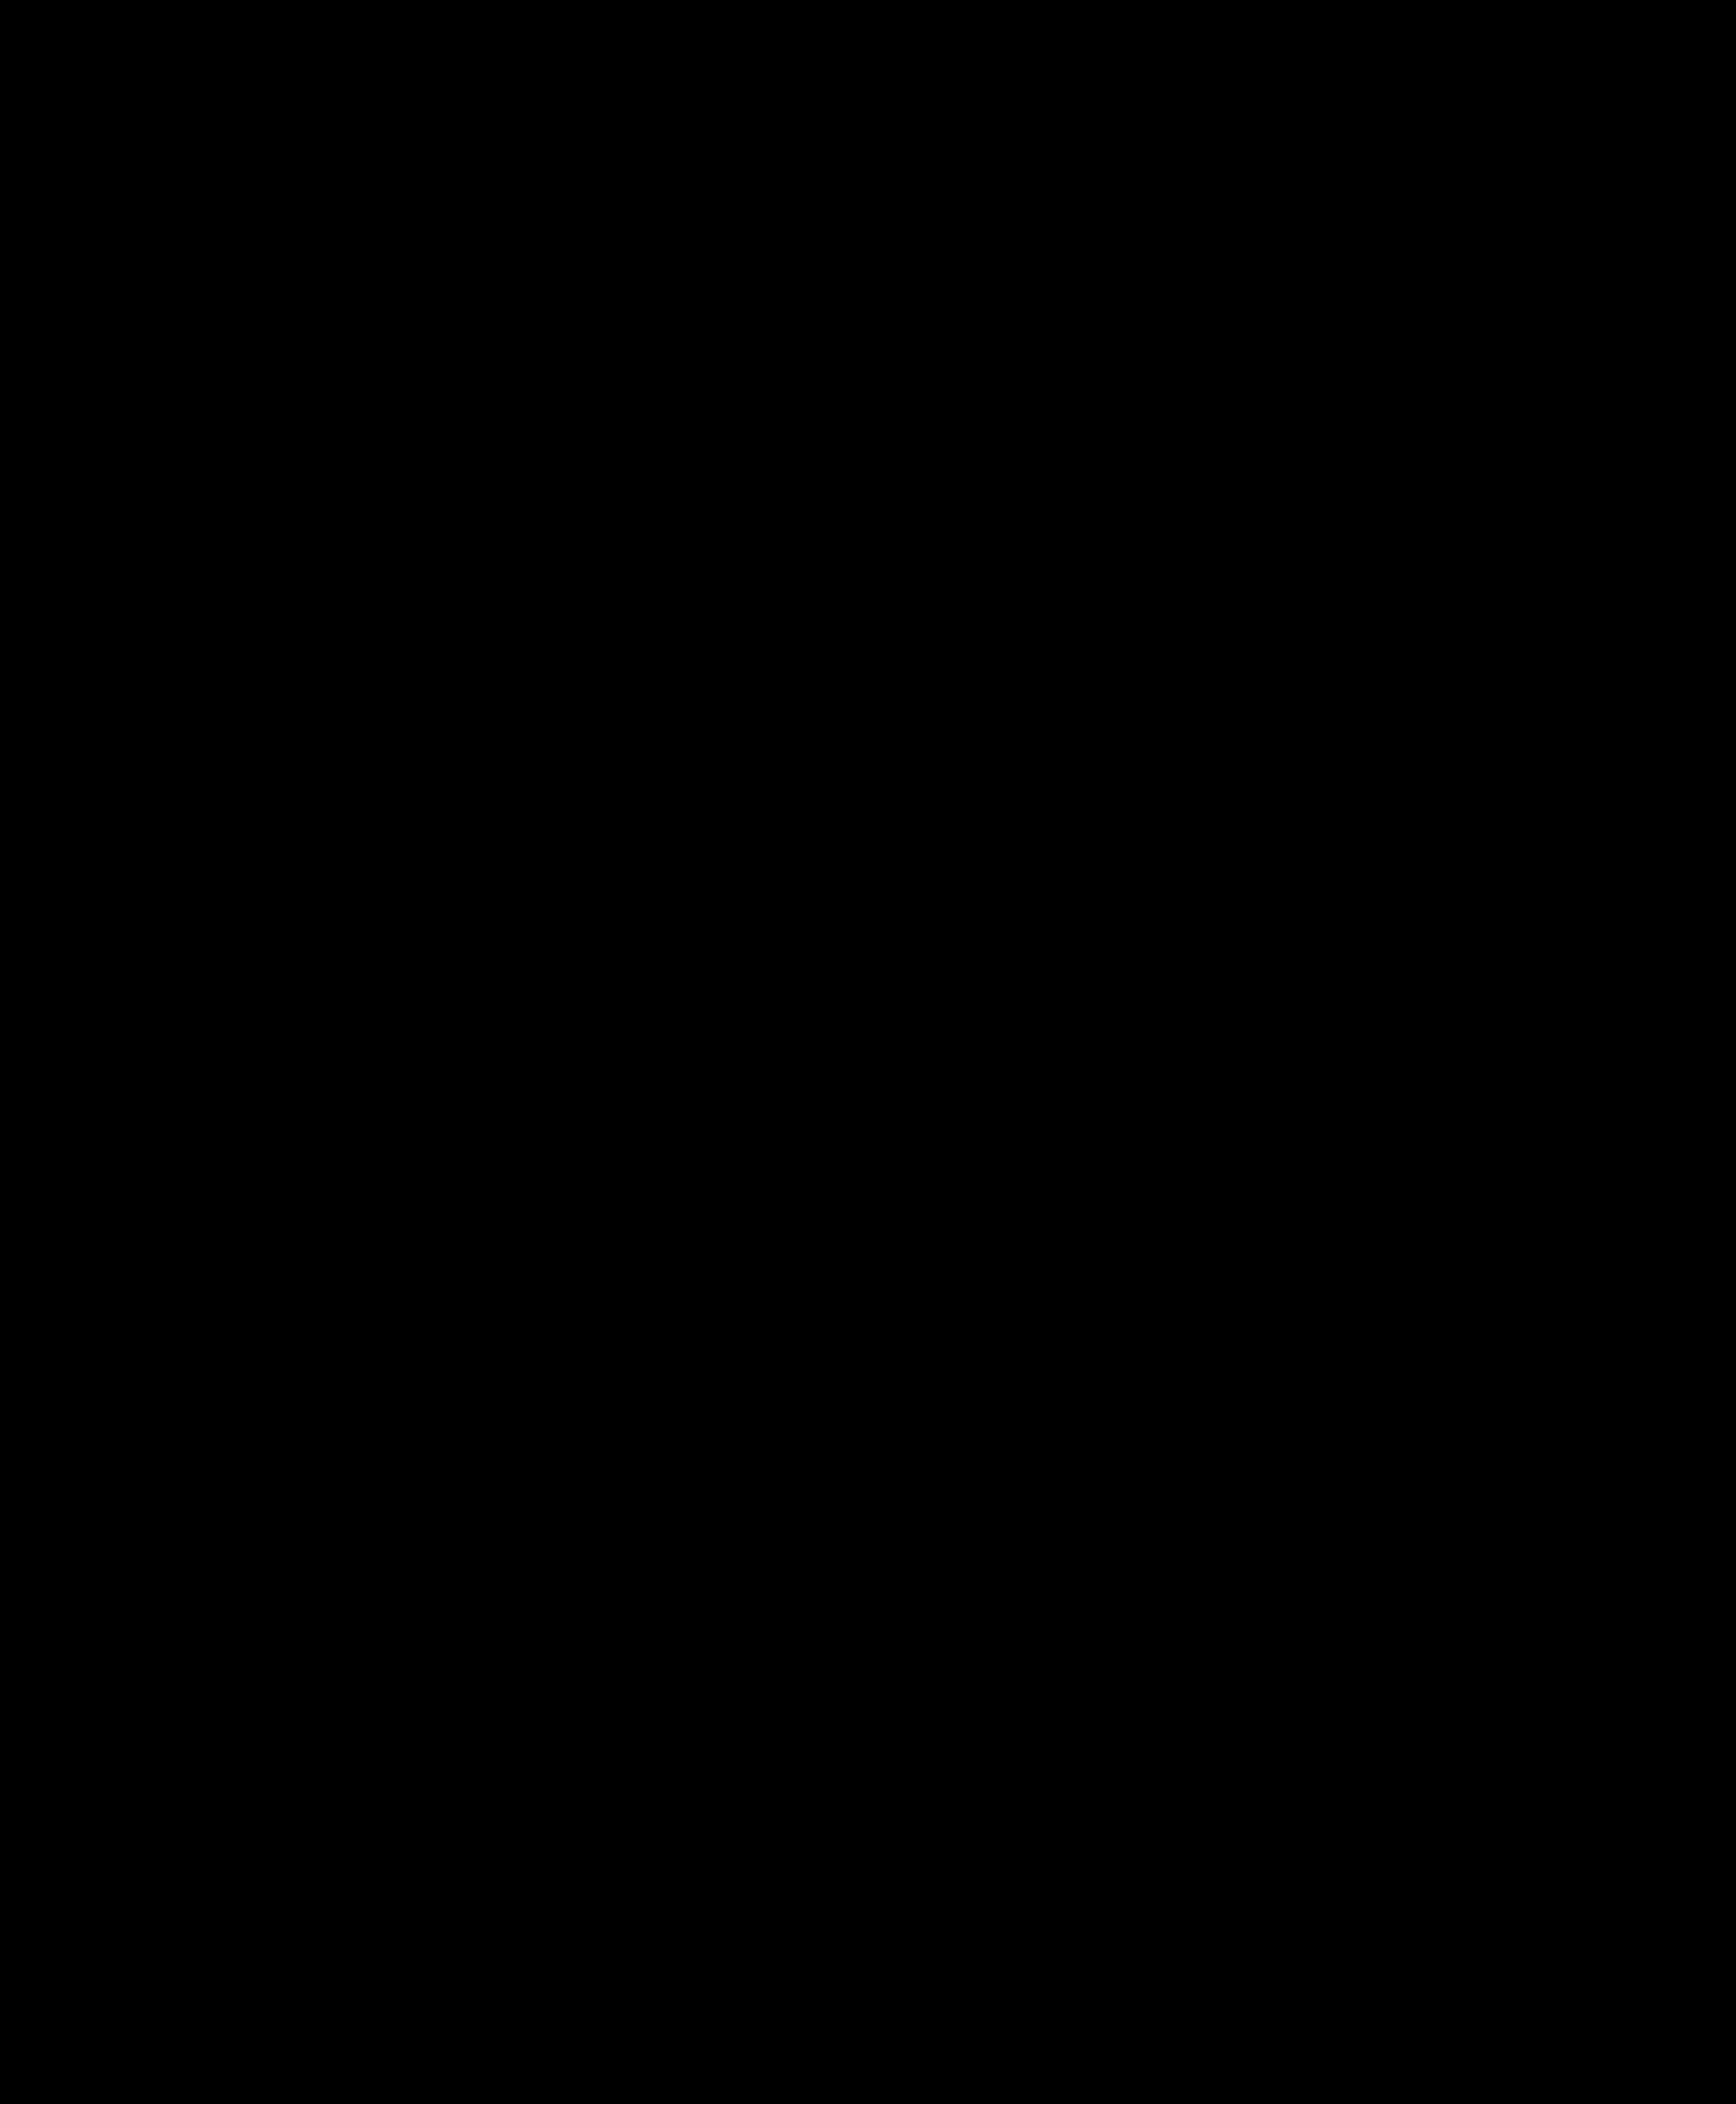 Stiftung Spitzenflühli